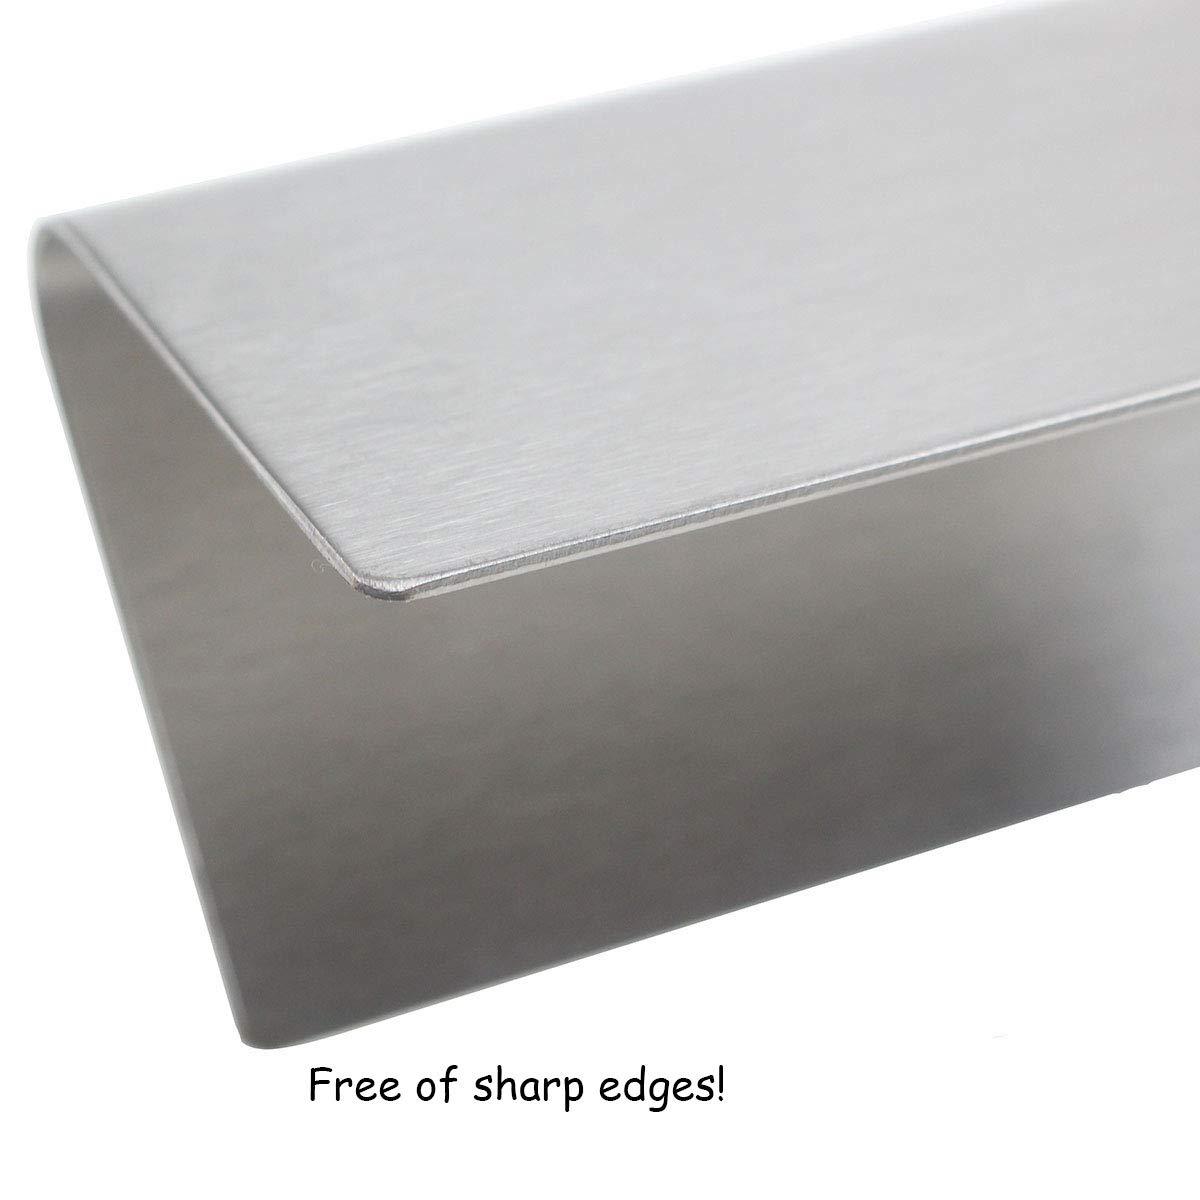 QuliMetal 7620, 16 Gauge, 17.5'' Stainless Steel Heat Shield for Weber Genesis Flavor Bars, Fit Genesis 300, E310, S310, E330, EP-330 by QuliMetal (Image #3)